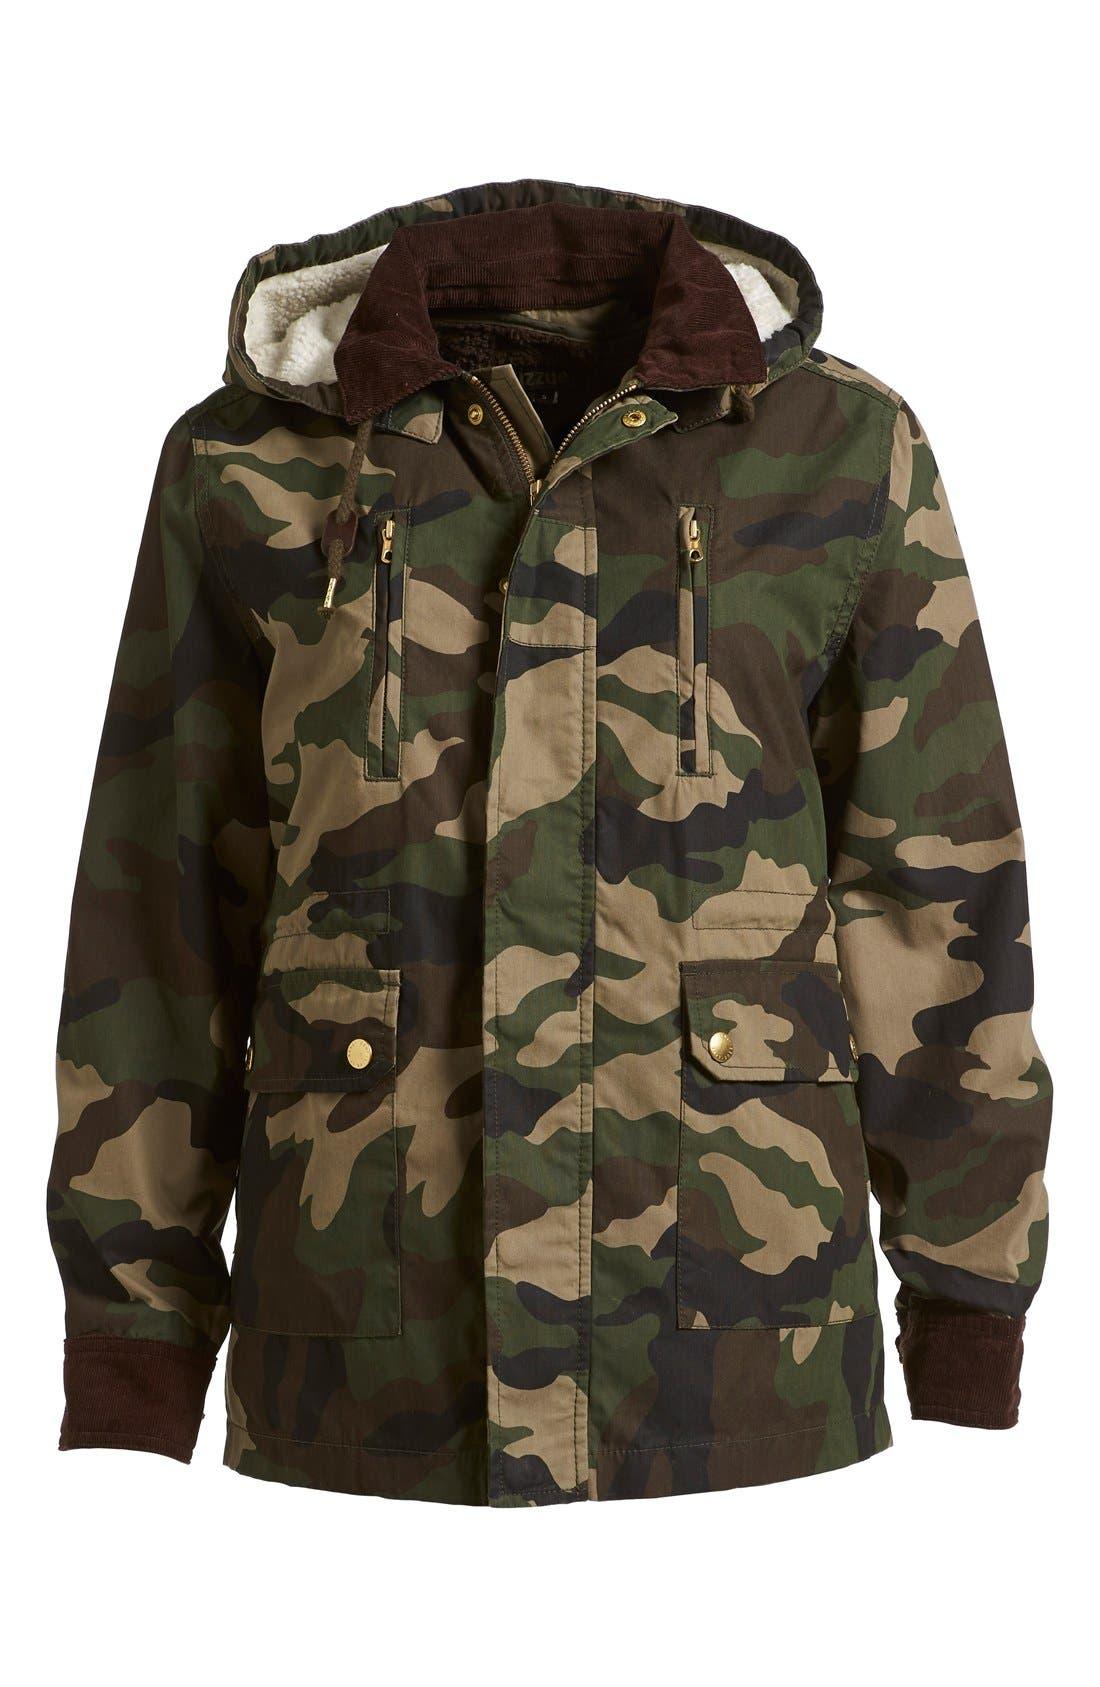 Alternate Image 1 Selected - izzue Hooded Camouflage Jacket (Women)